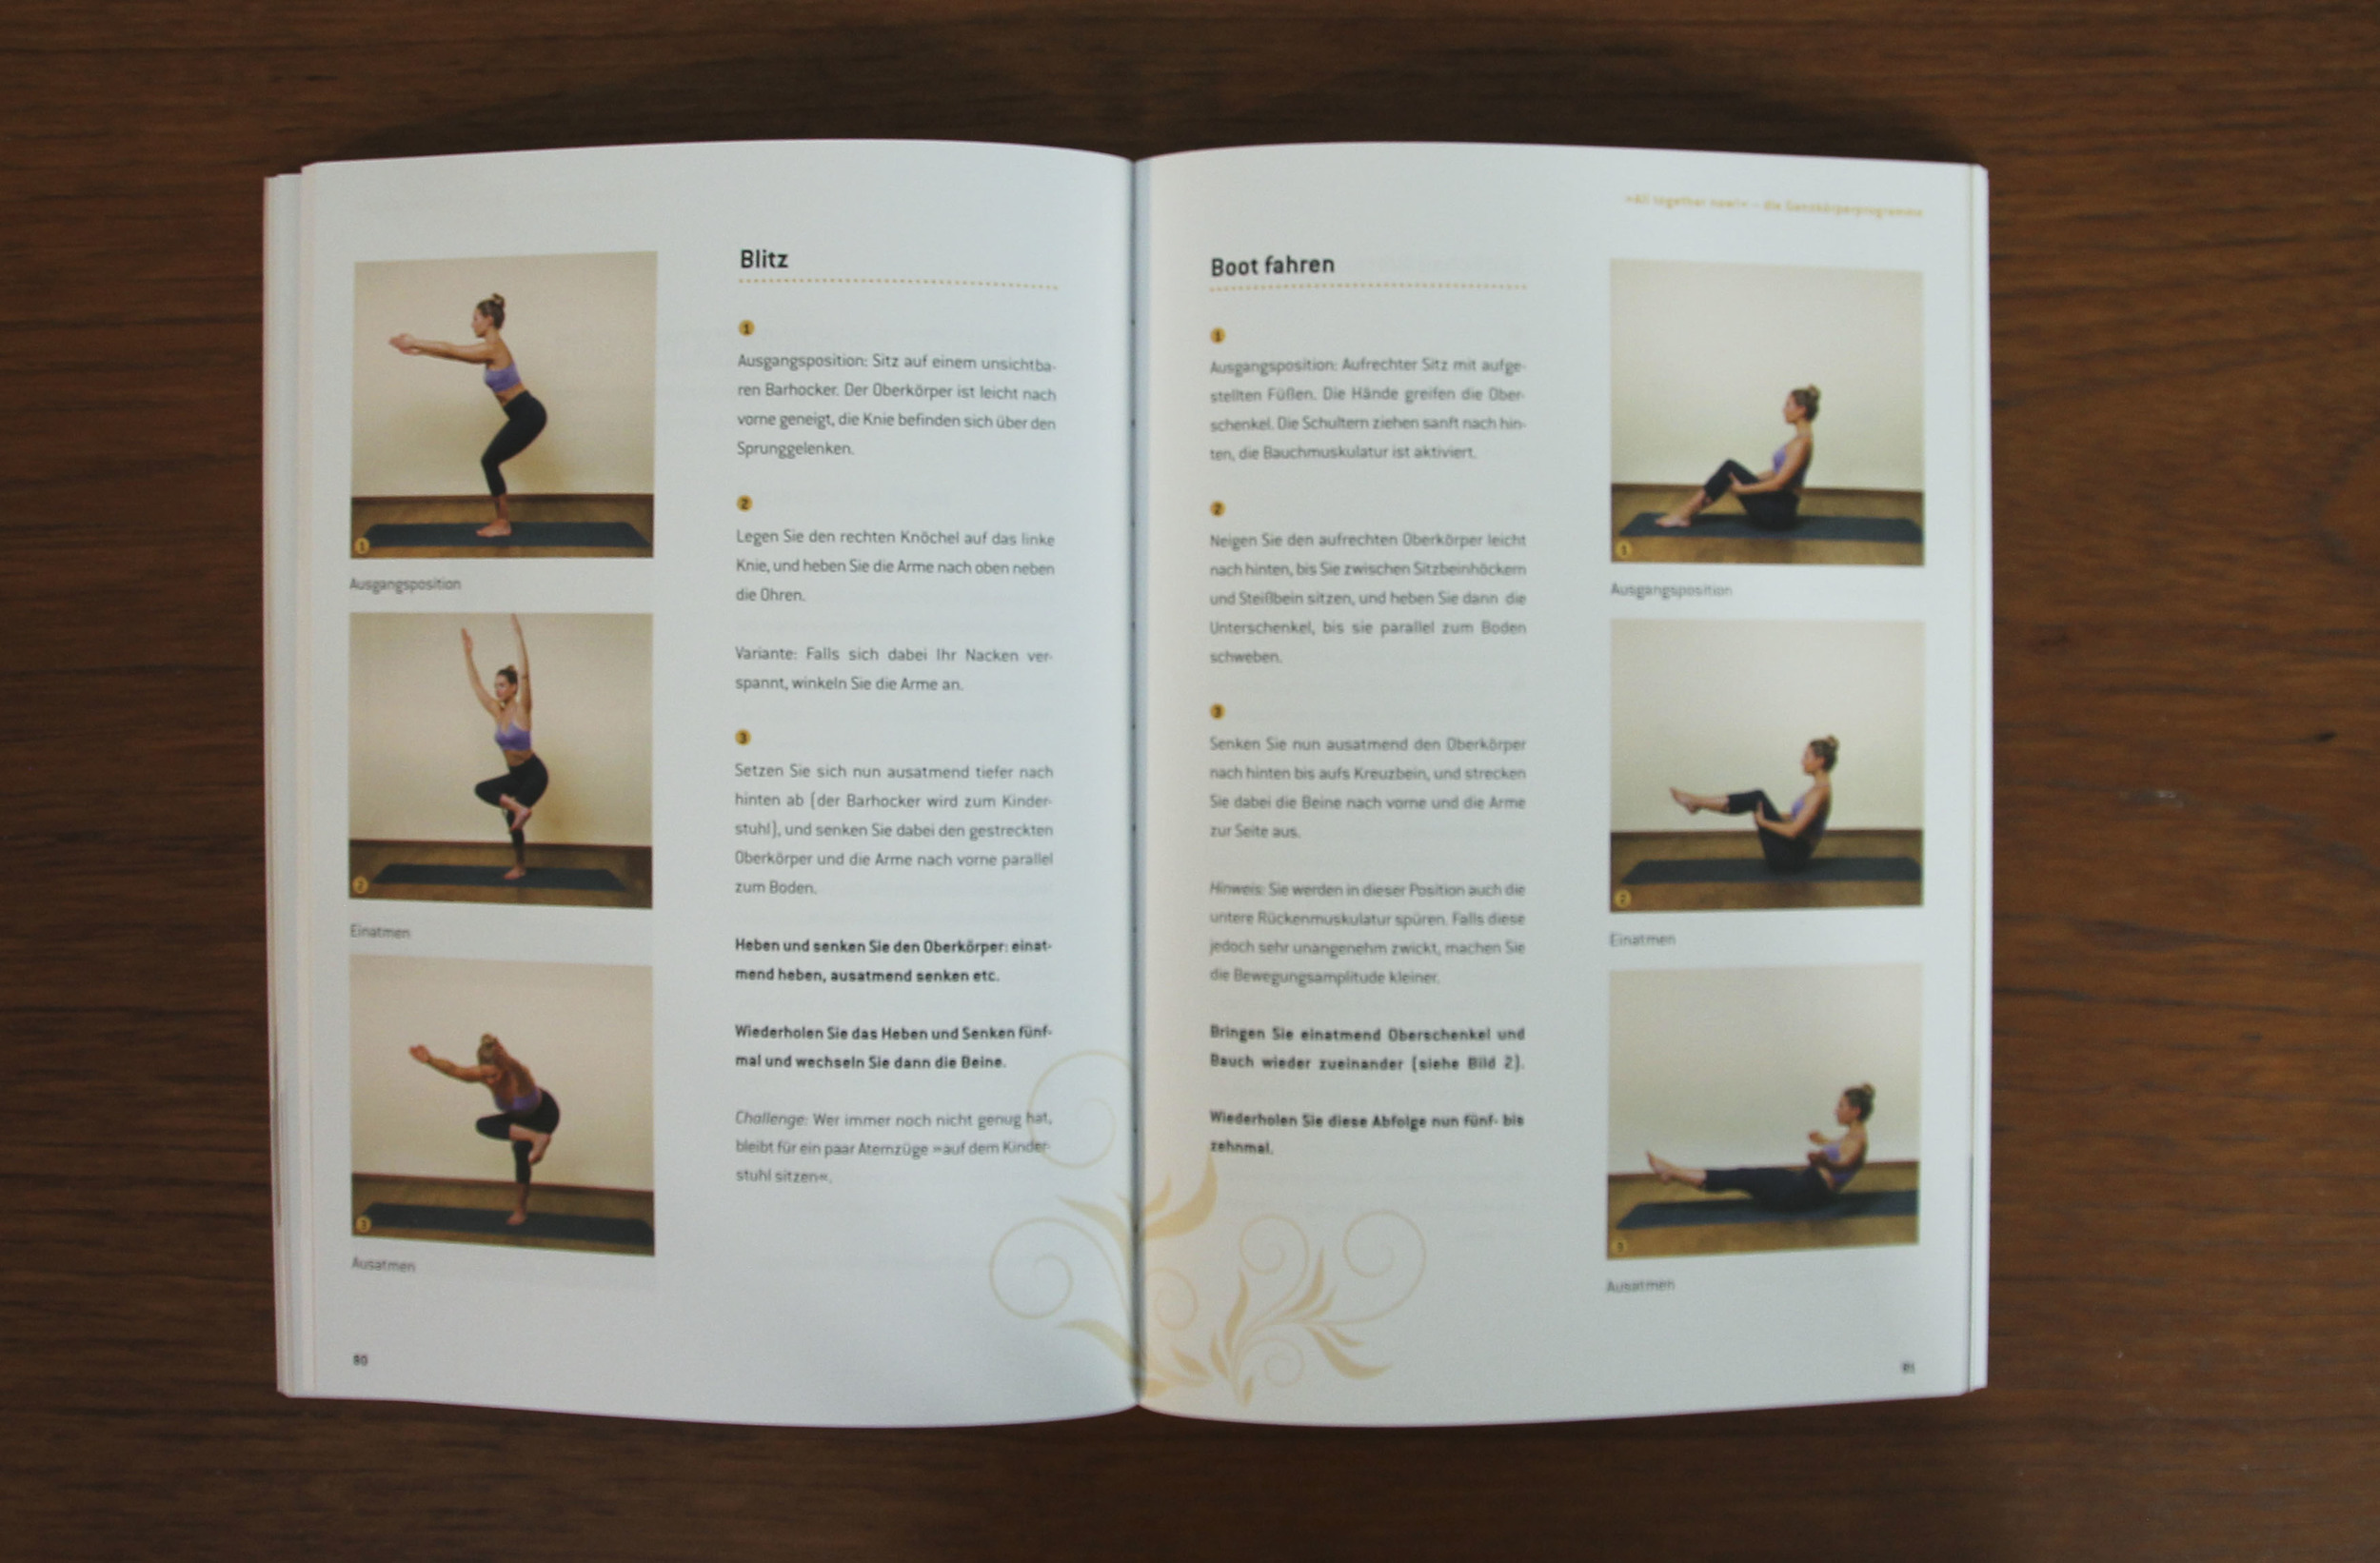 yoga after work3927.jpg